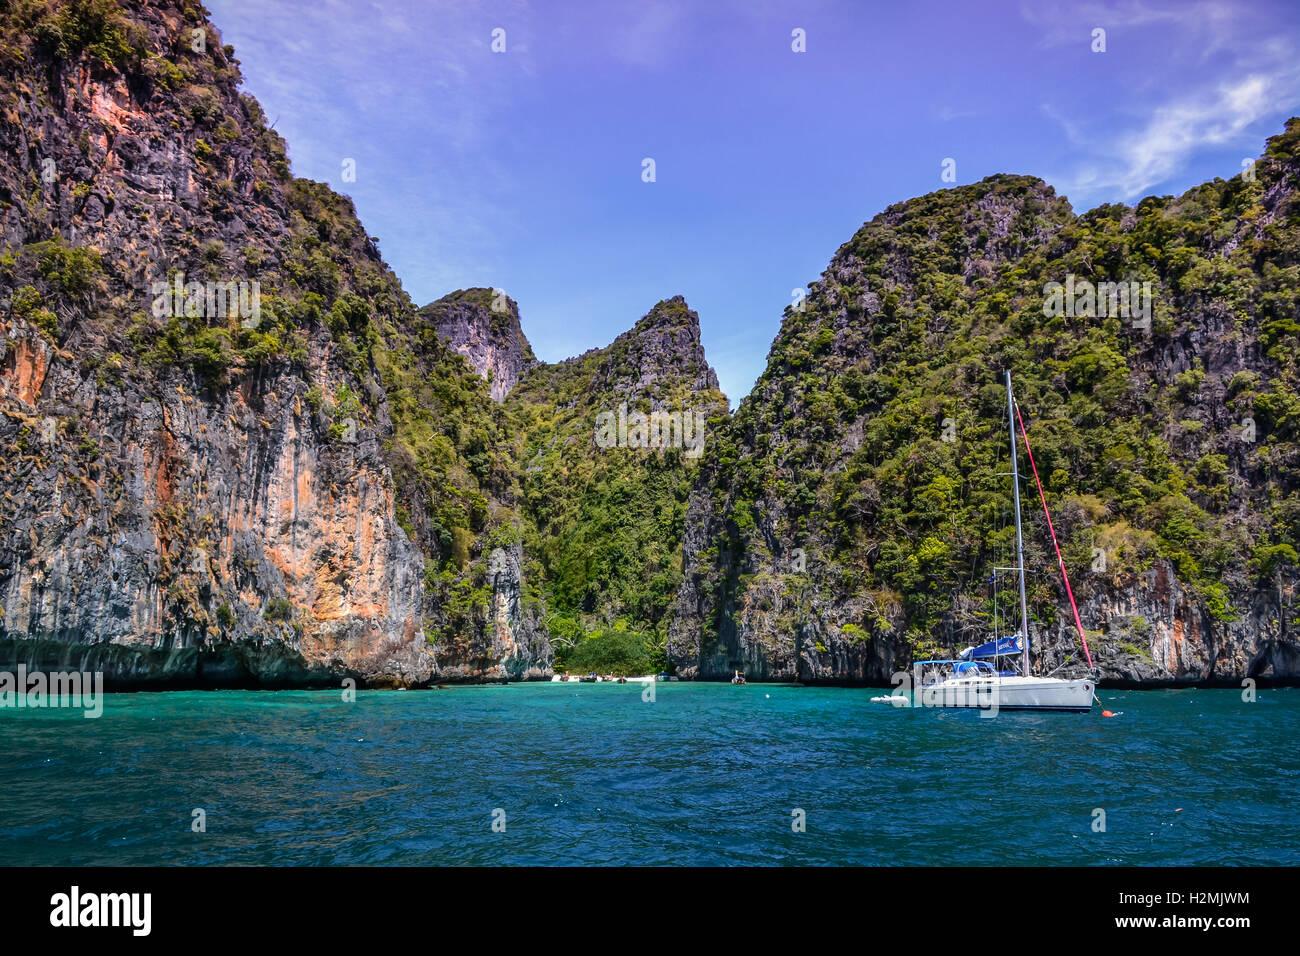 Phuket, boat, sea, water, landscape, mountains, - Stock Image